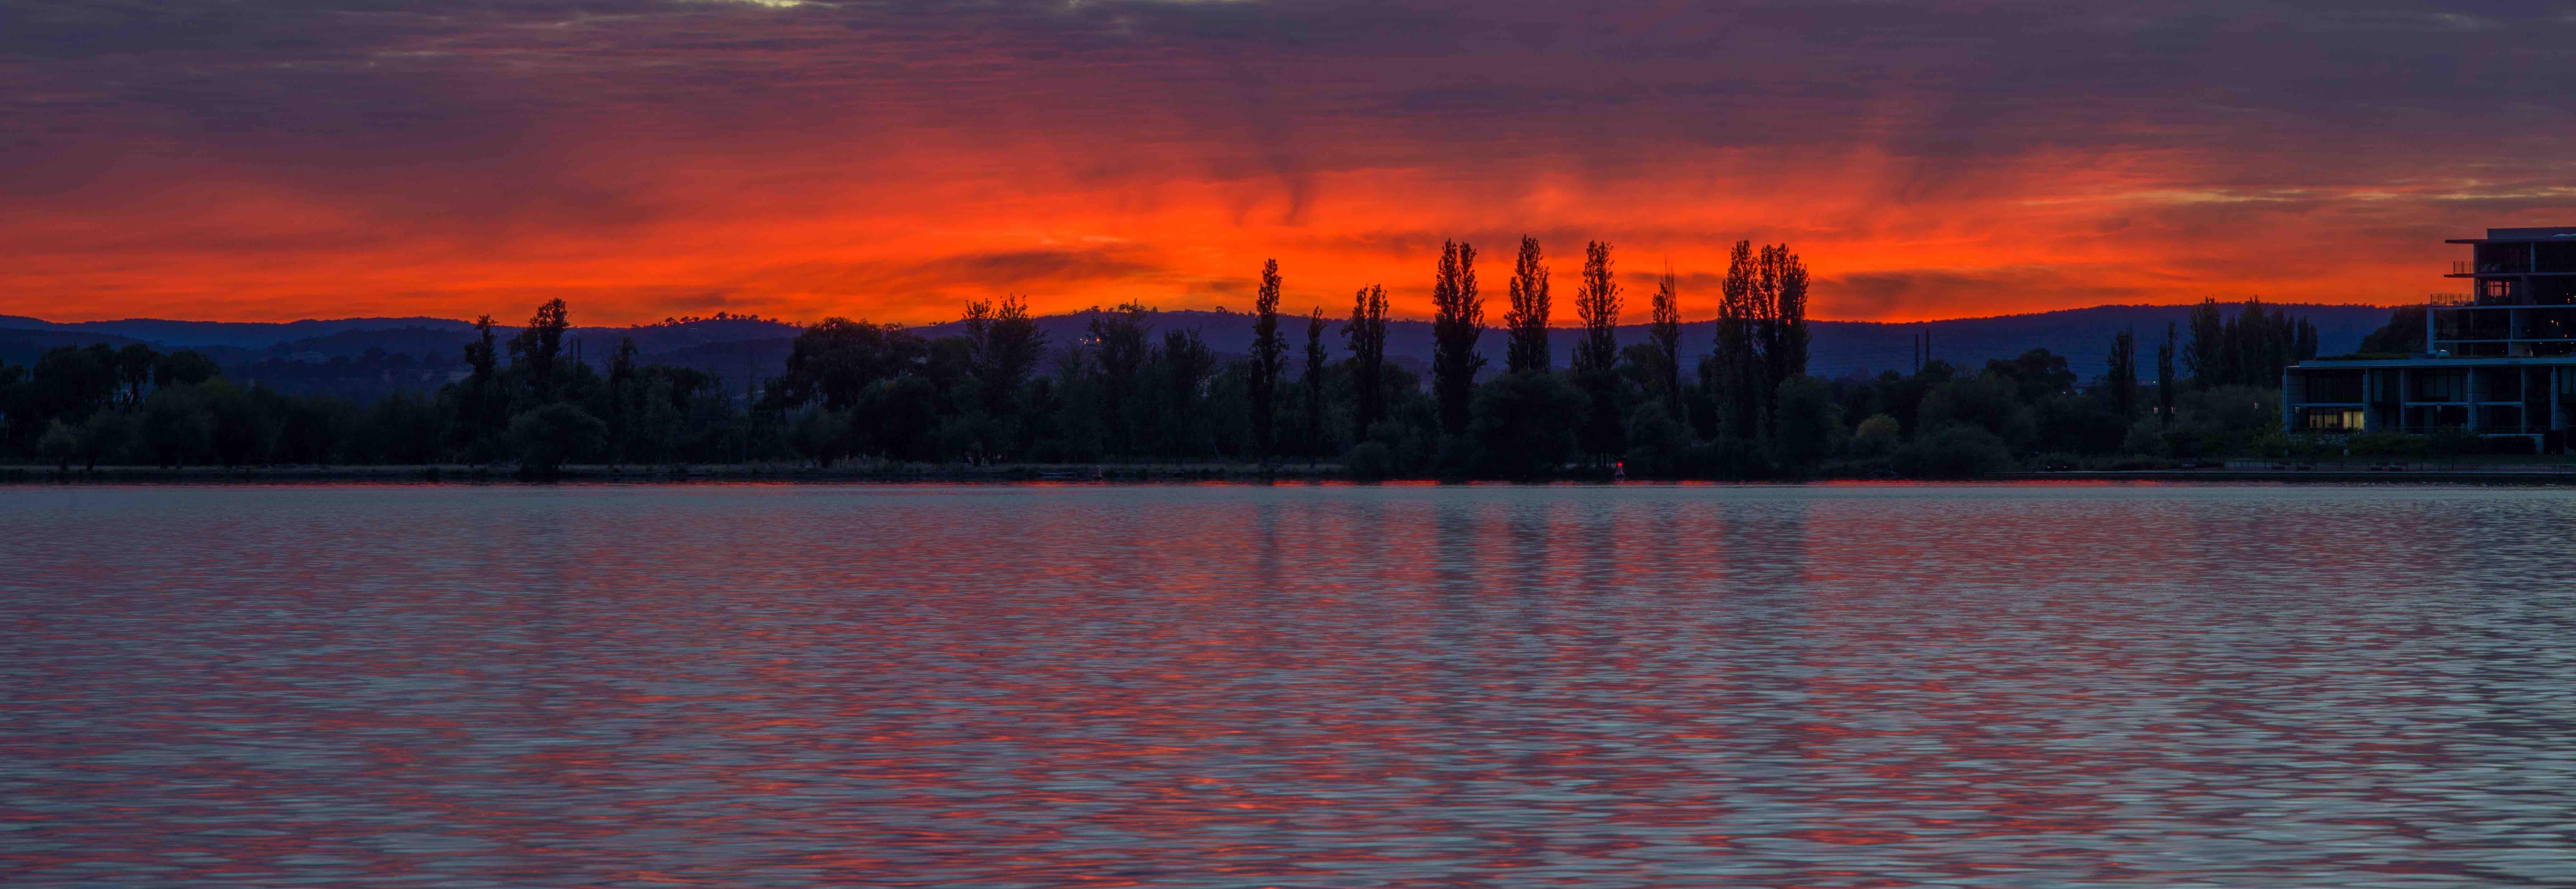 Sunrise in Canberra (Photo: MomentsForZen/Flickr)